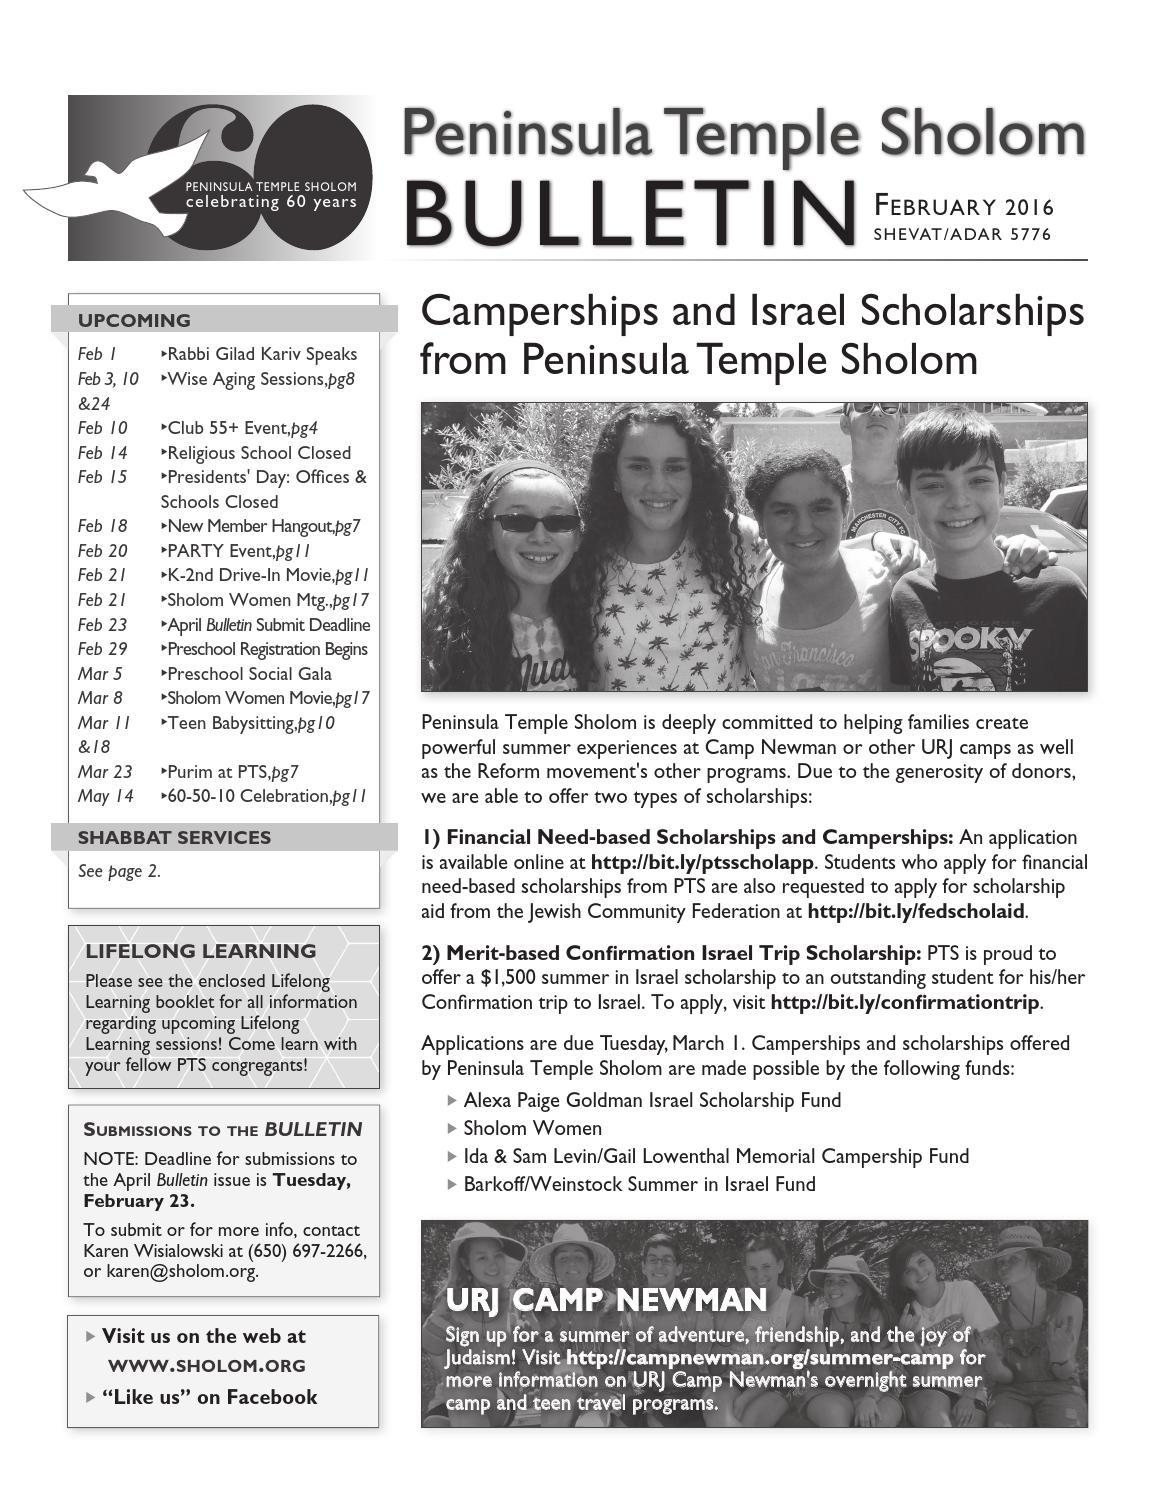 peninsula temple sholom bulletin 2016 by ptsholom issuu